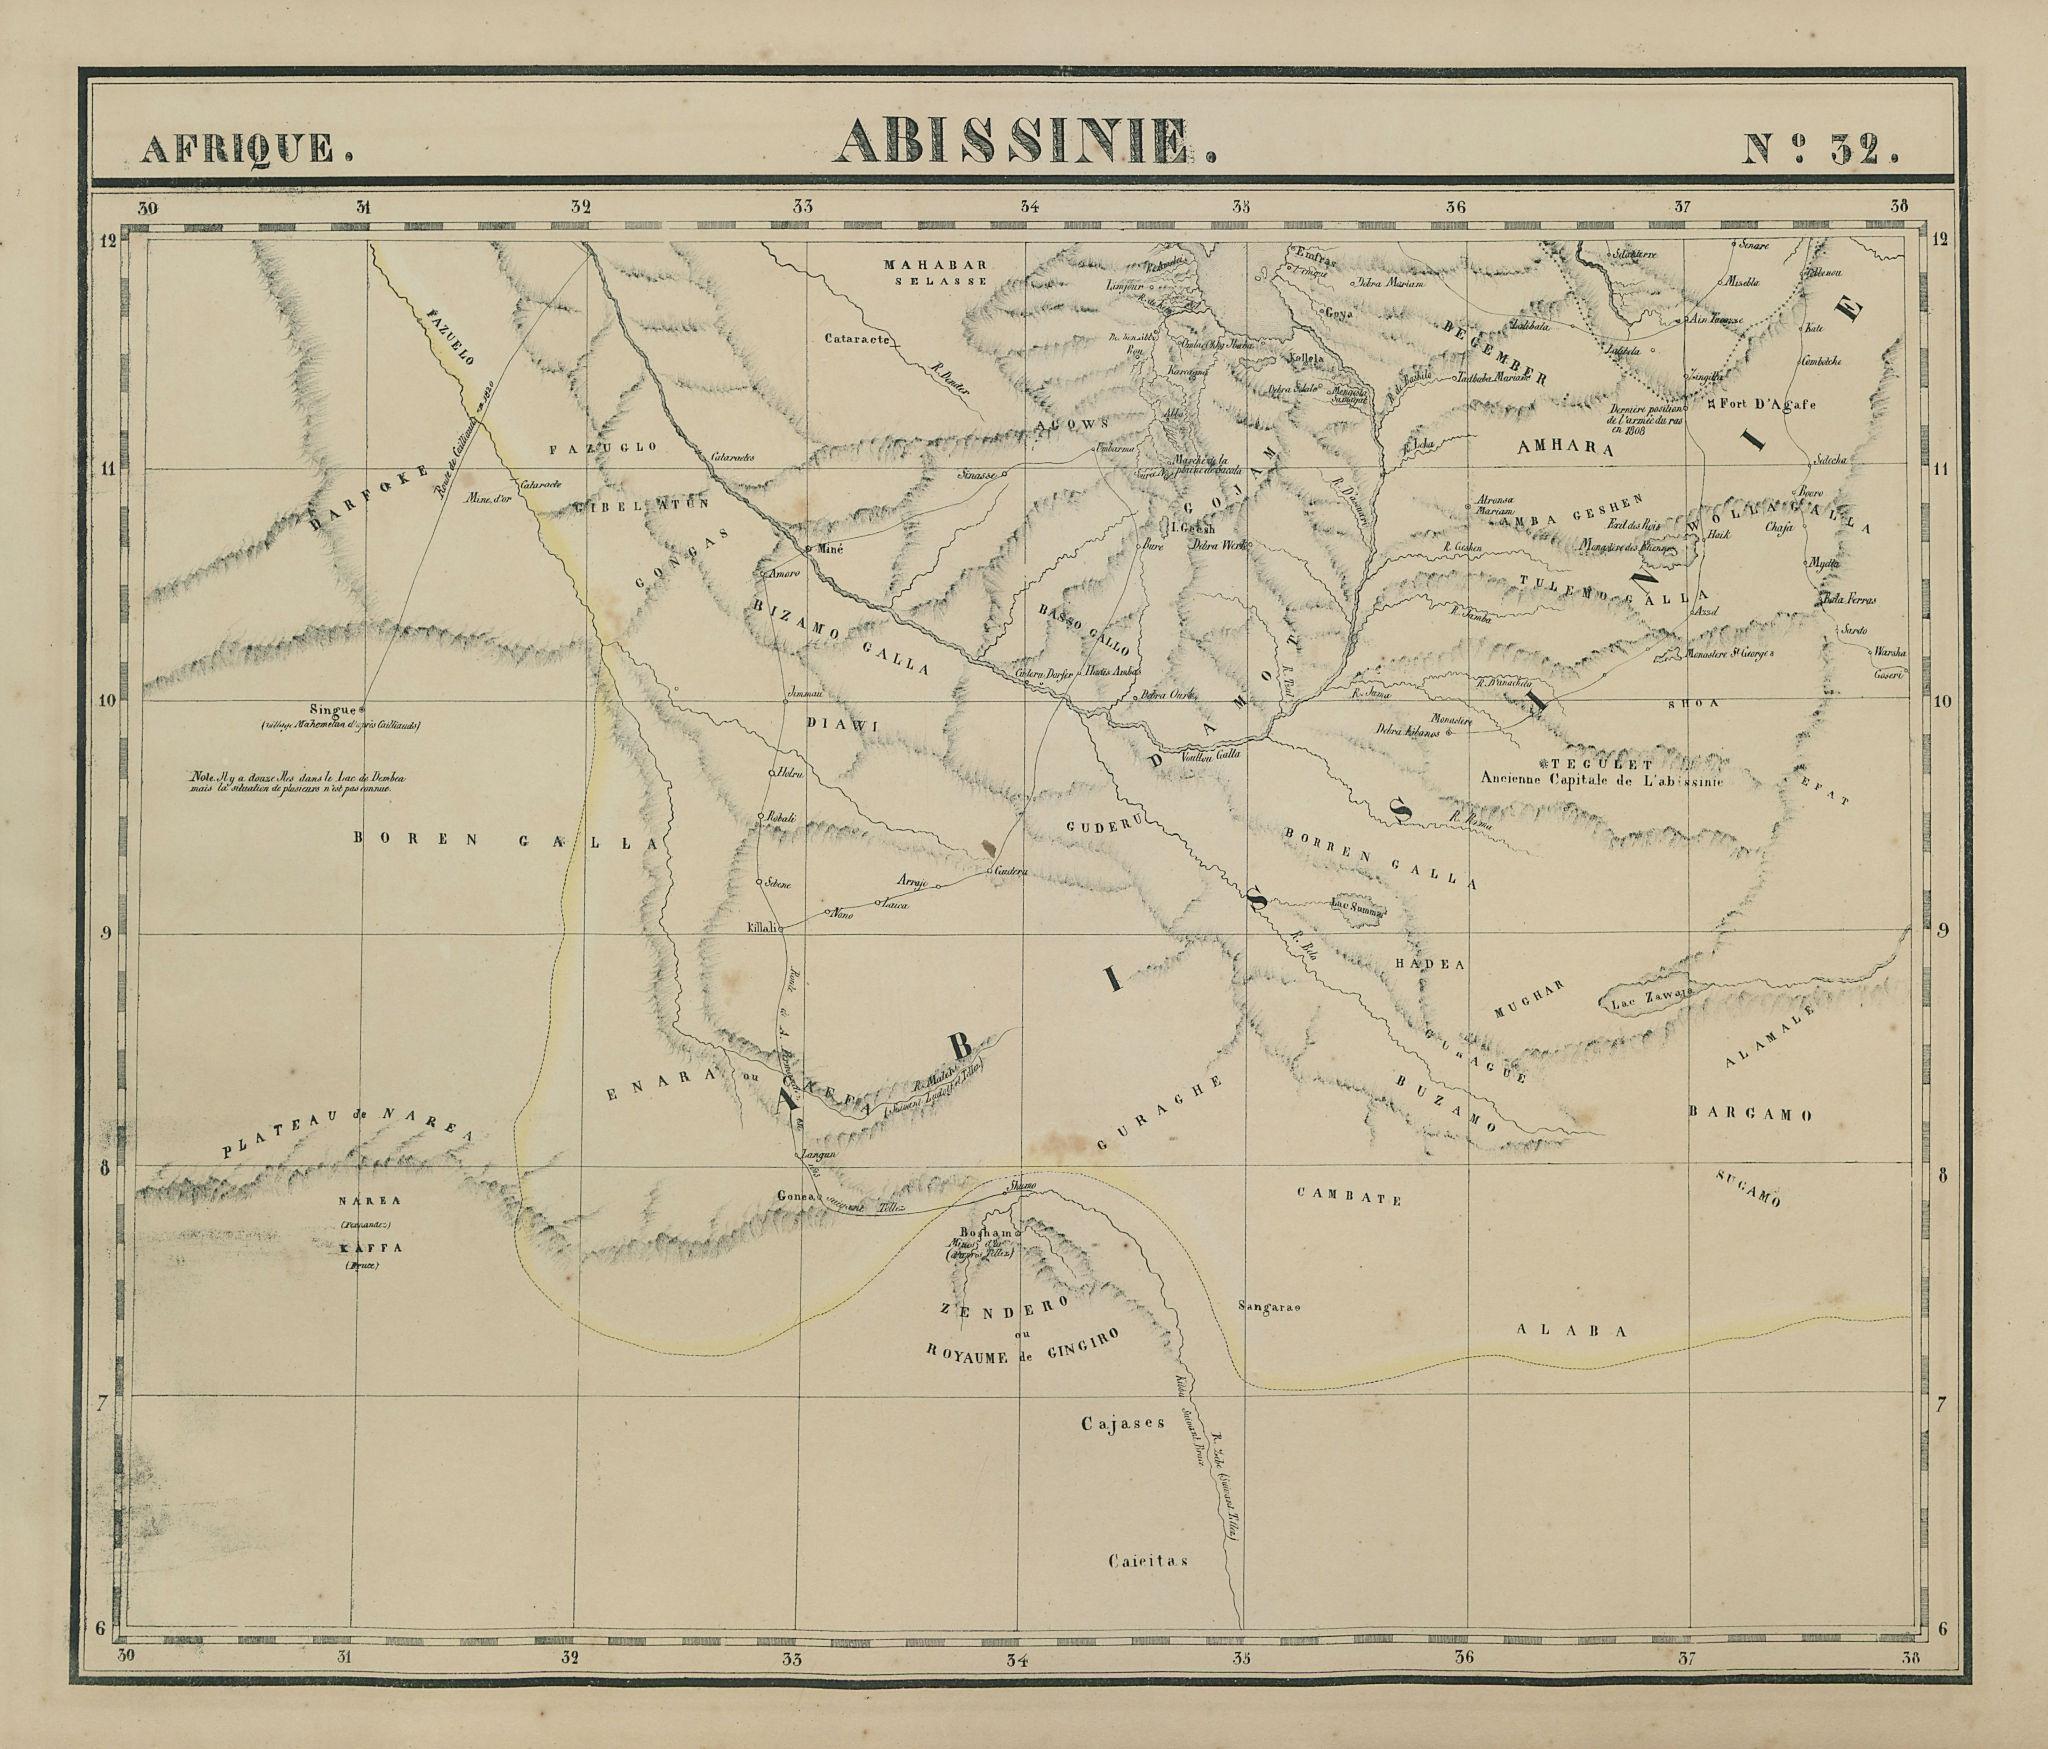 Afrique. Abissinie #32. Western Ethiopia. Blue Nile. VANDERMAELEN 1827 old map